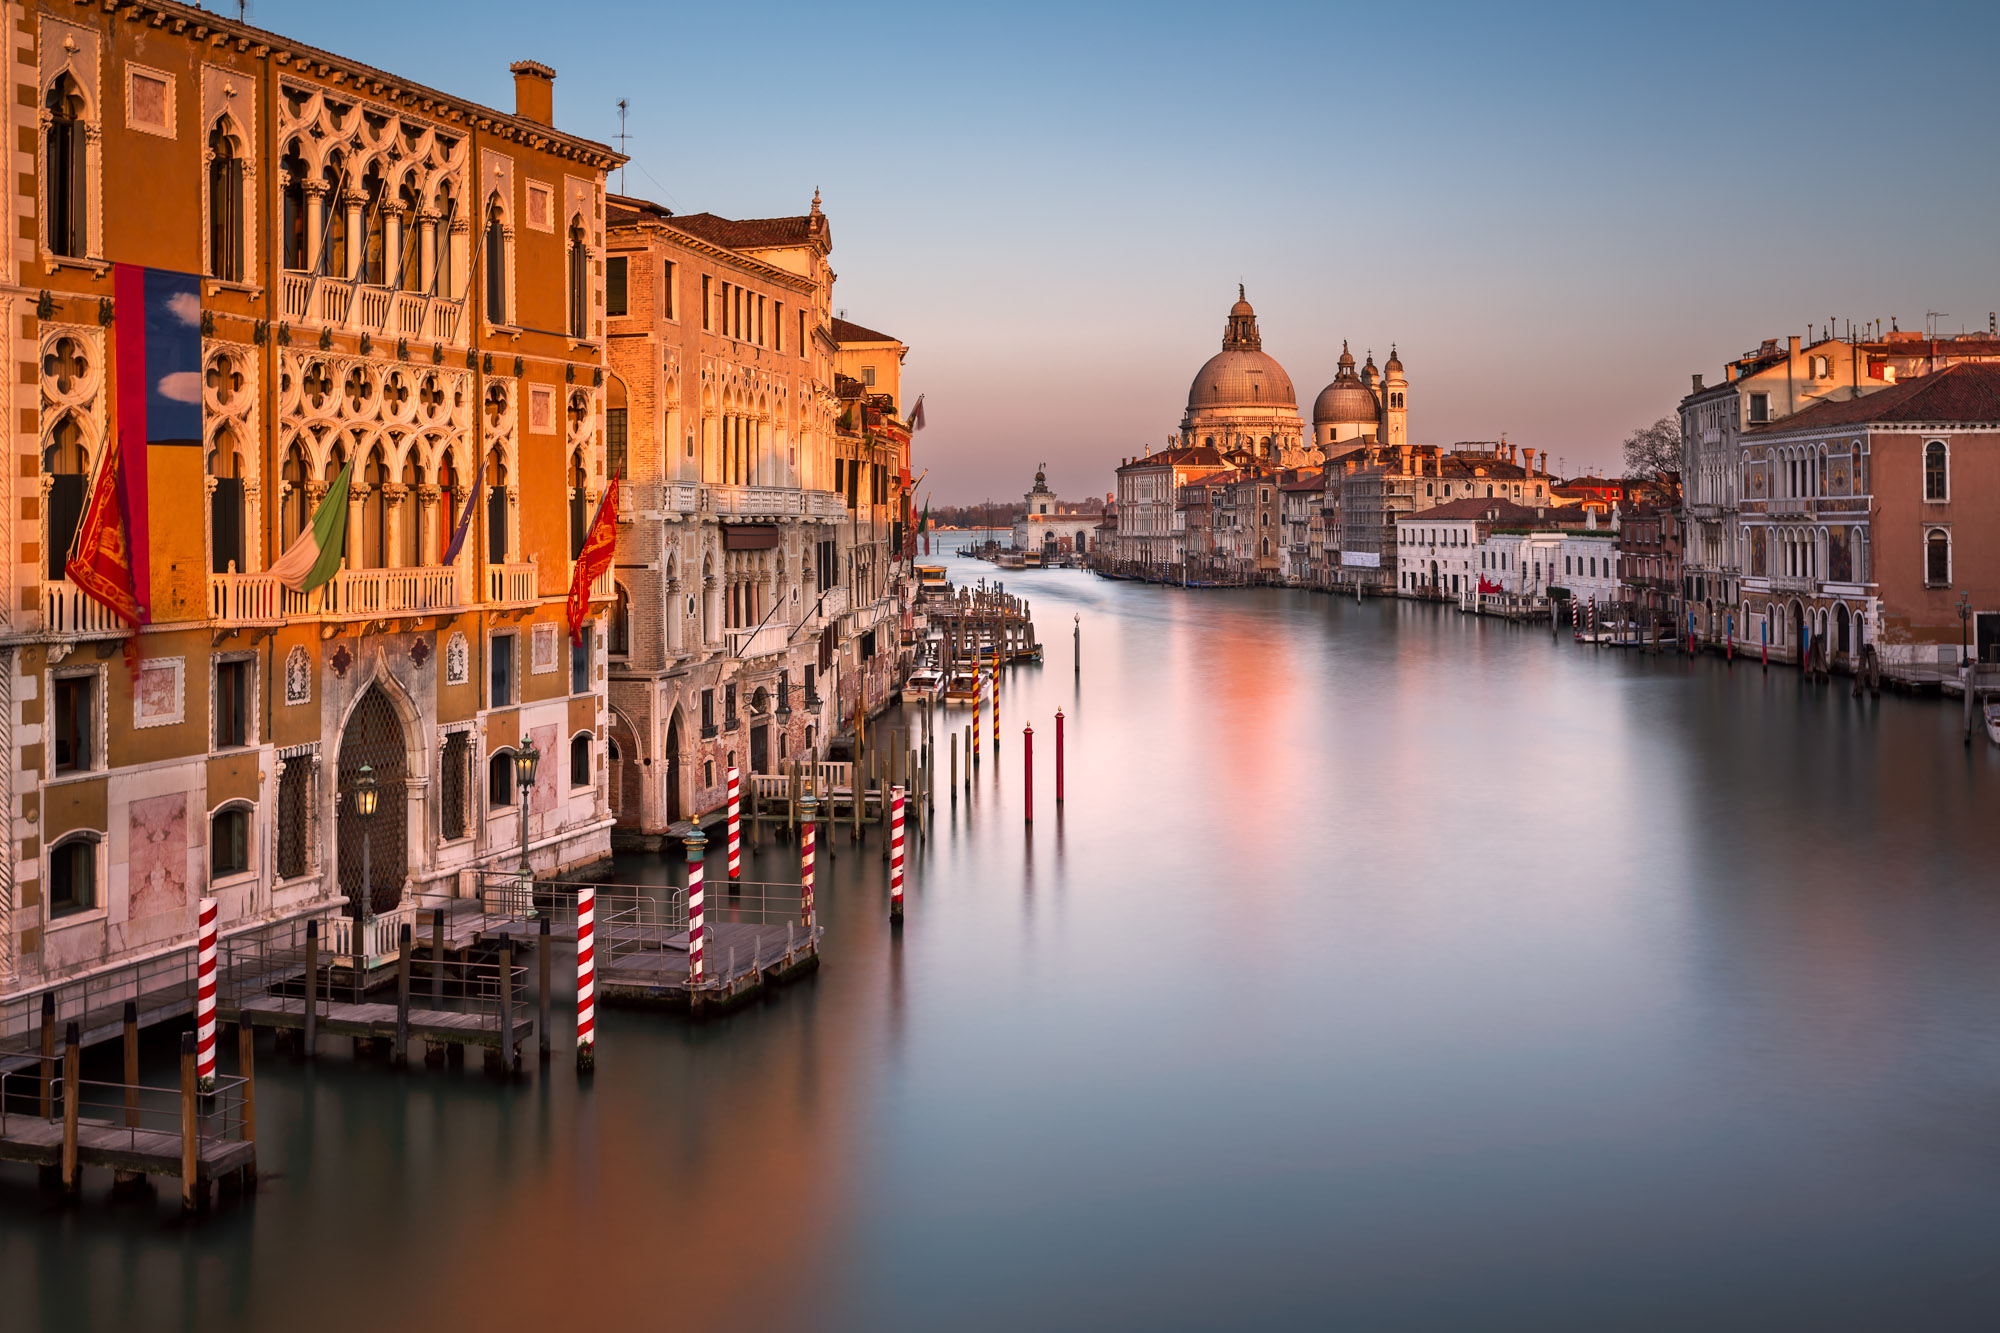 Grand Canal and Santa Maria della Salute Church at Sunset, Venice